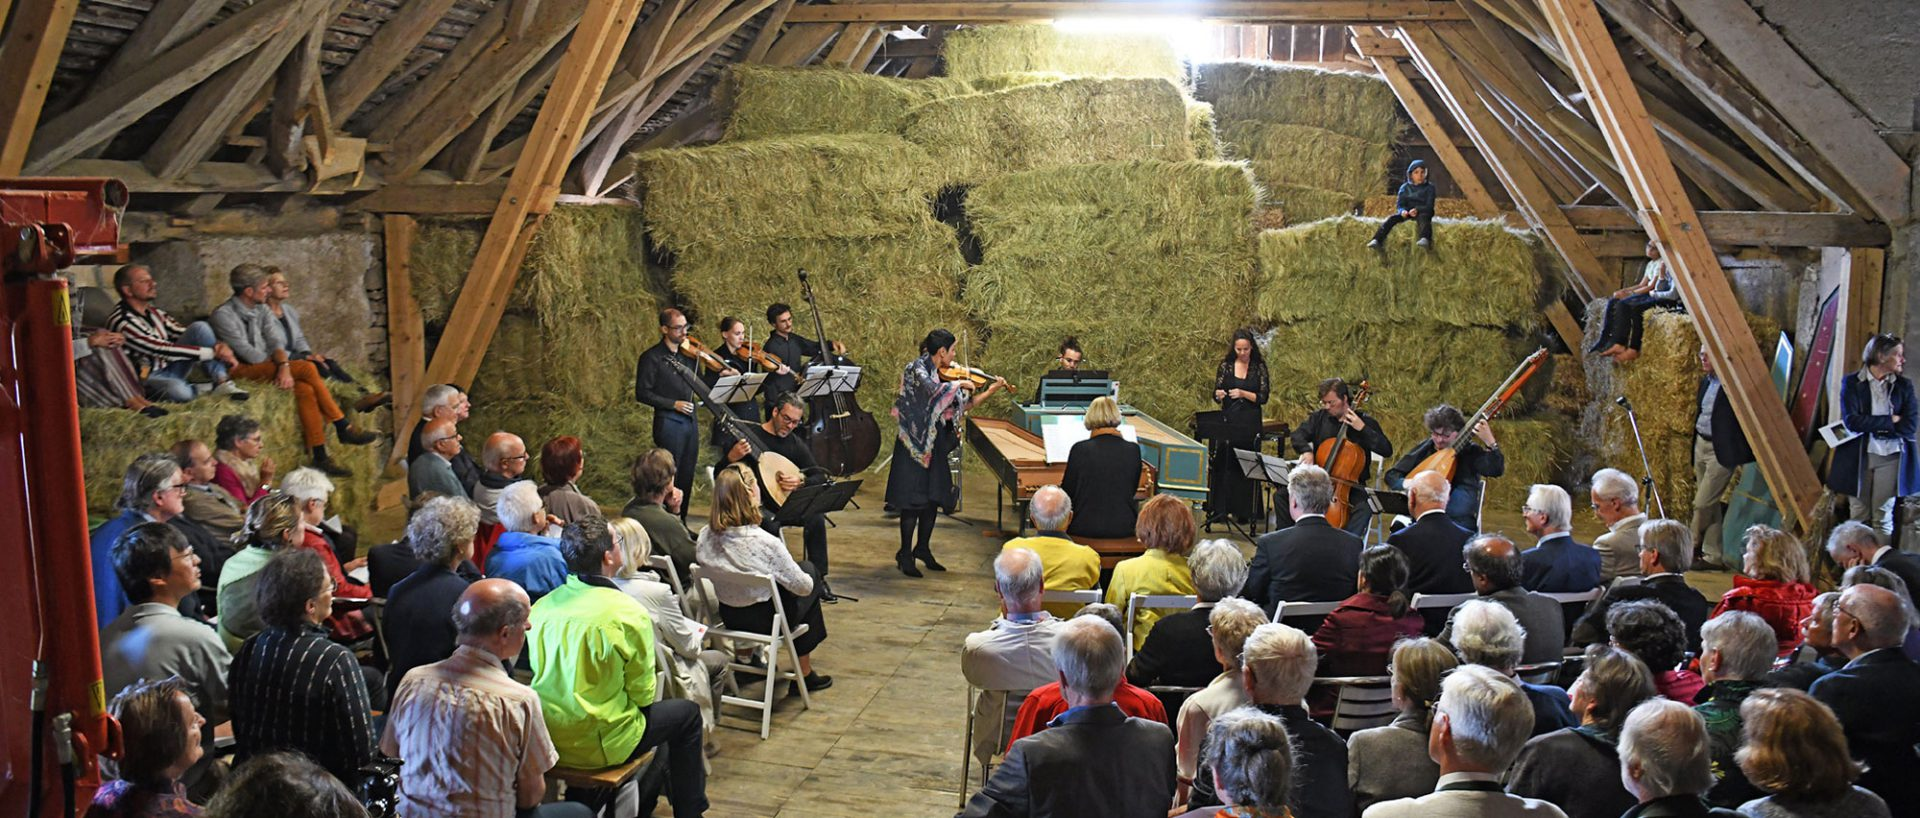 Ensemble MUSICA FIORITA 2019 auf dem Hofgut Mapprach